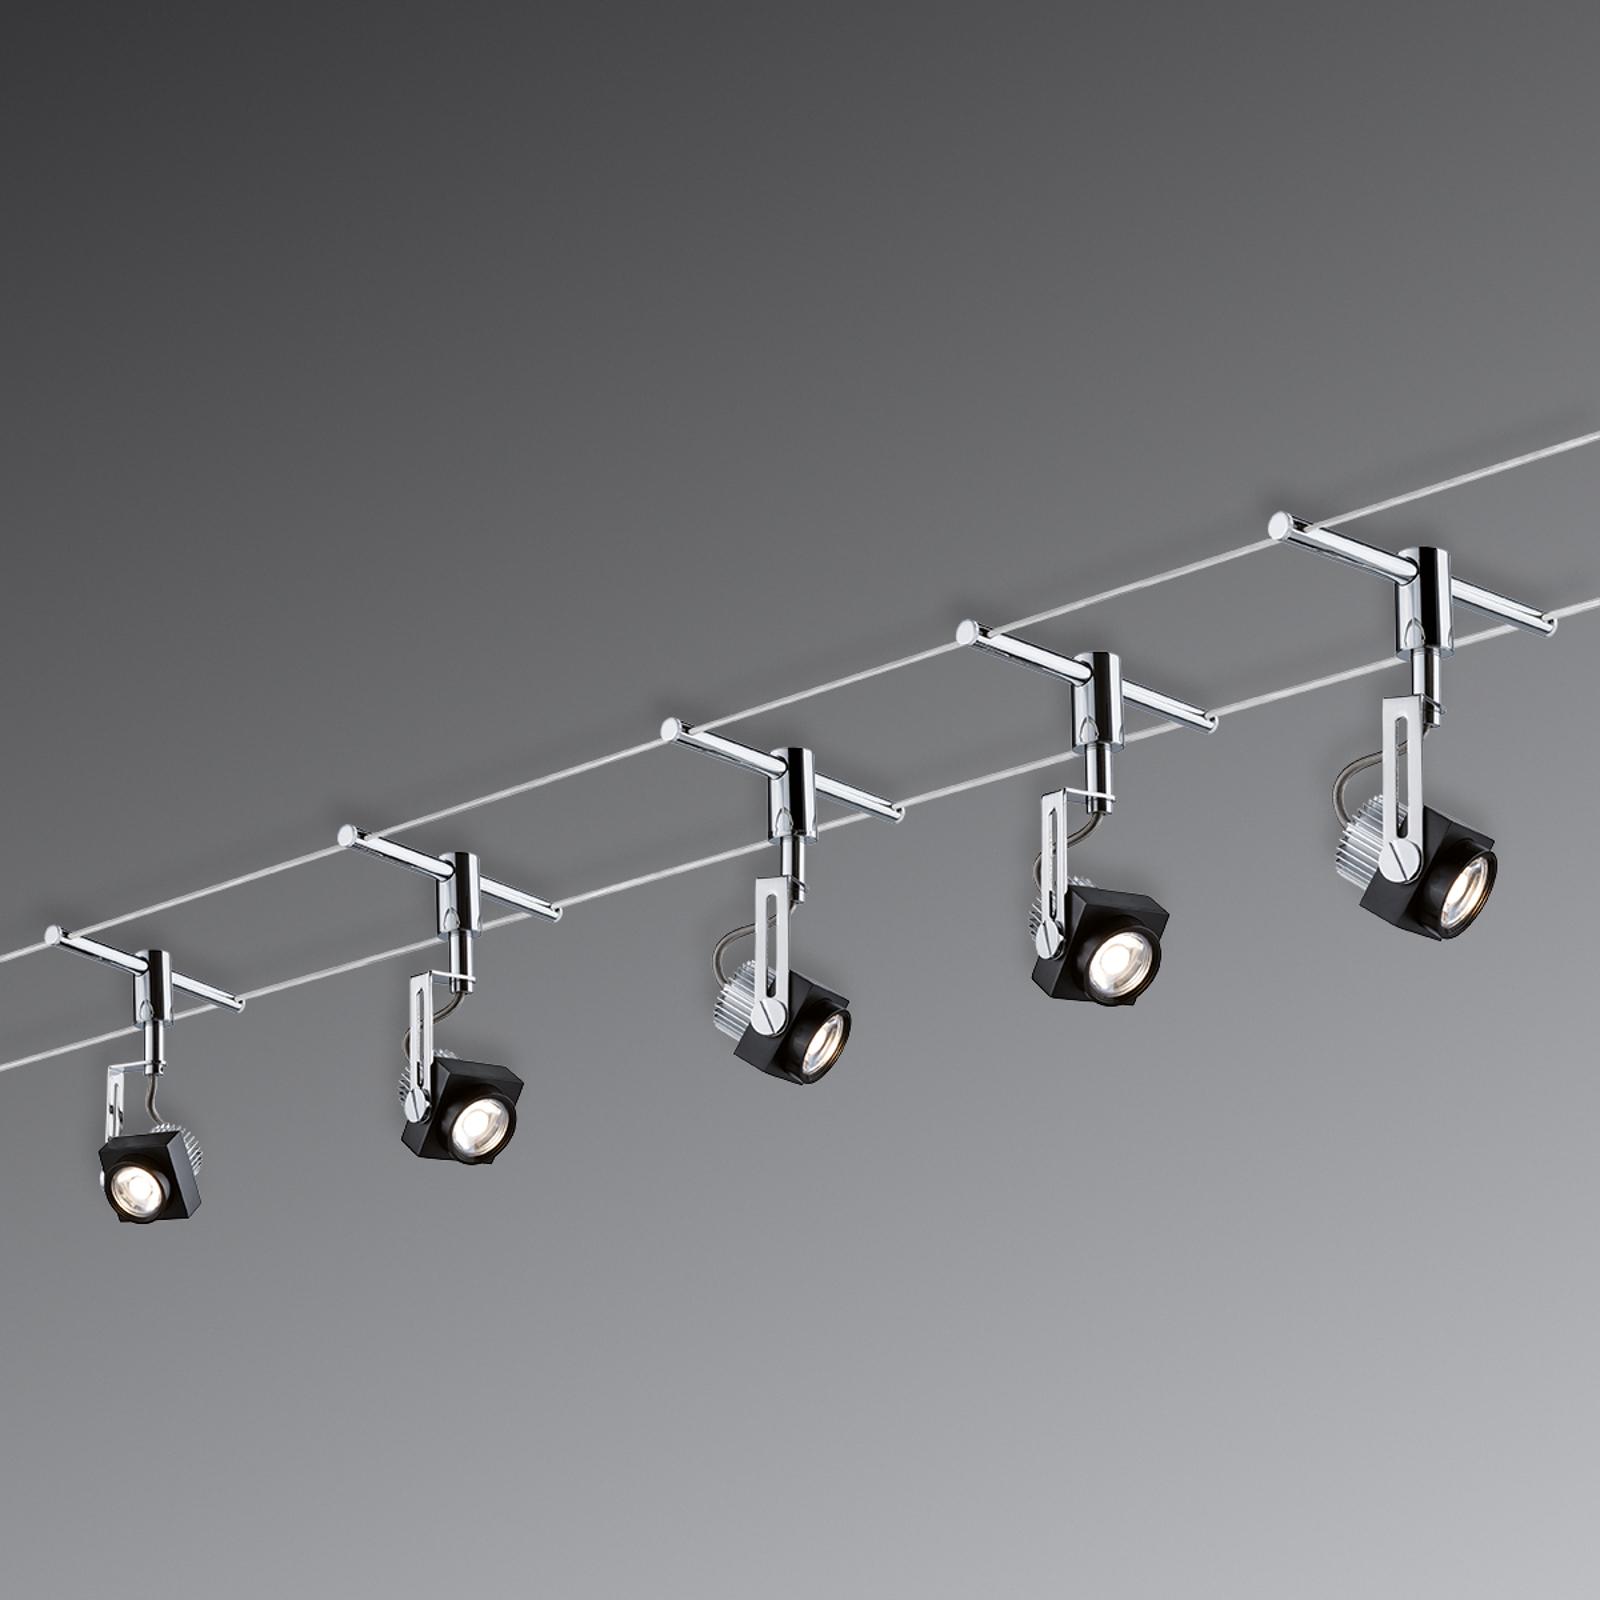 Paulmann Phase LED-Seilsystem komplett, 5-flammig